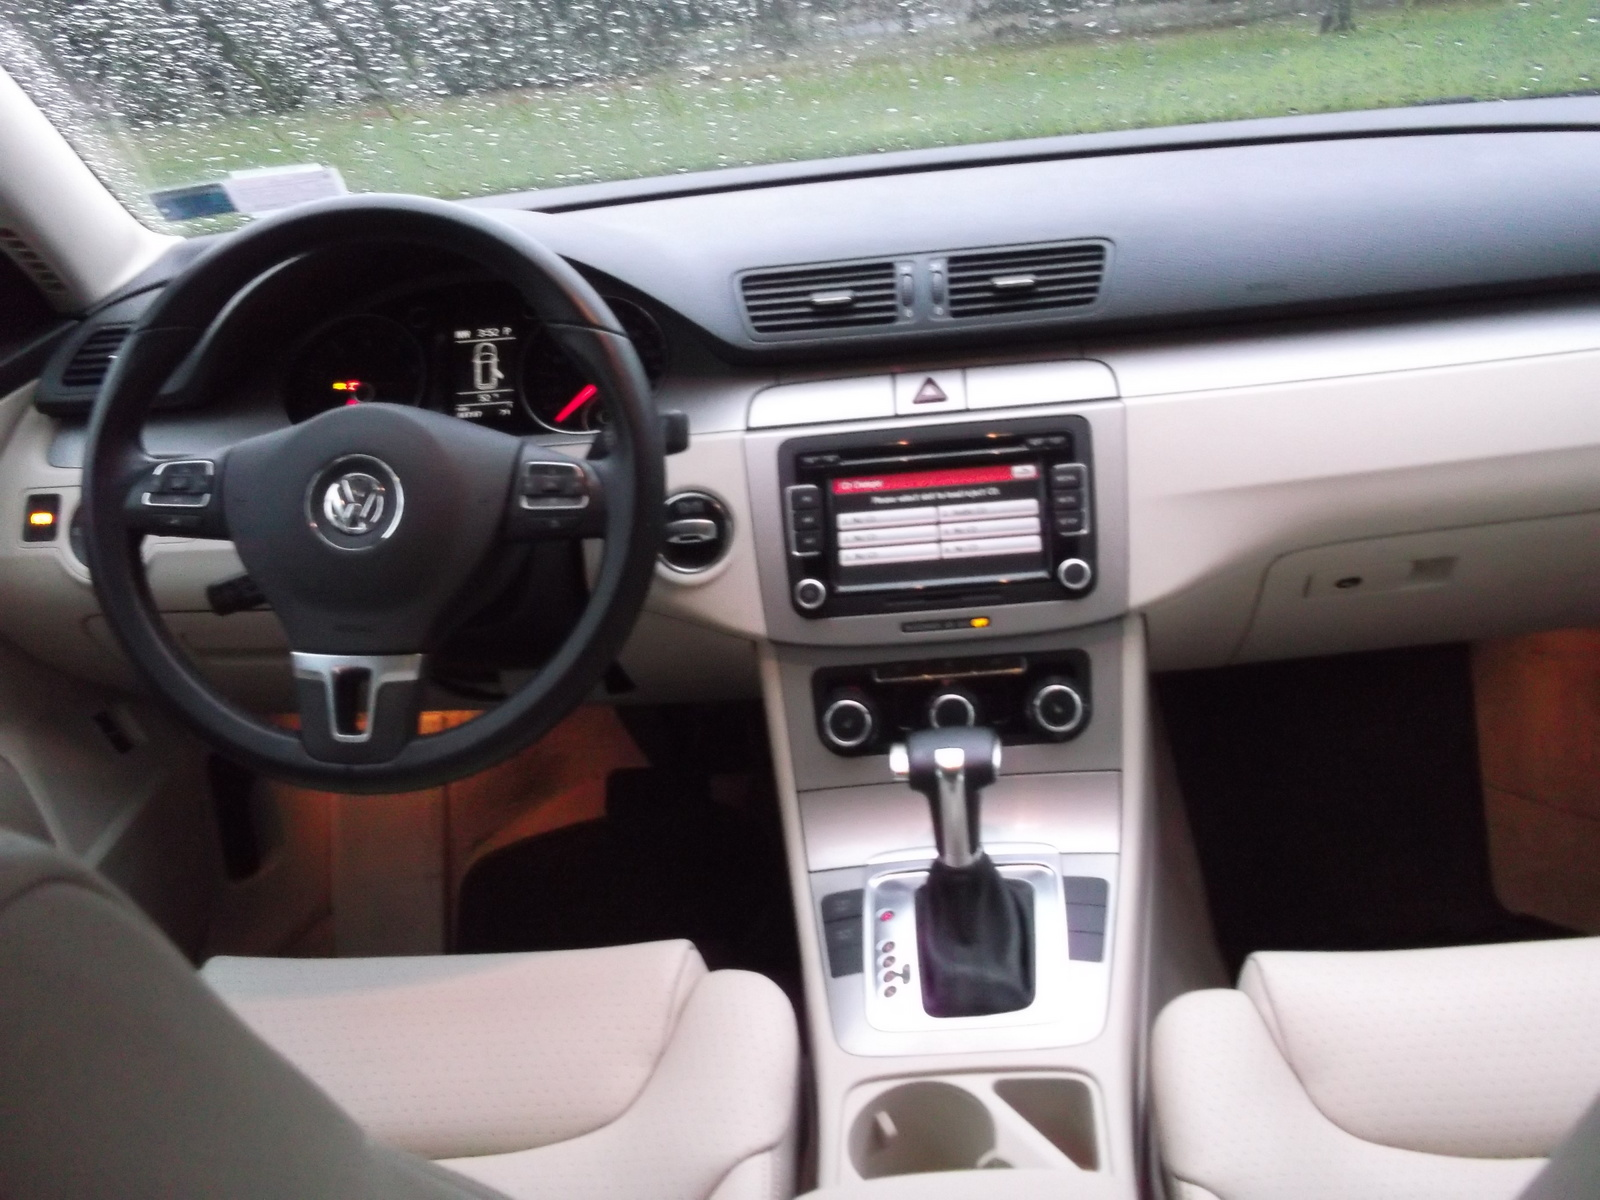 2010 Volkswagen Passat Interior Pictures Cargurus